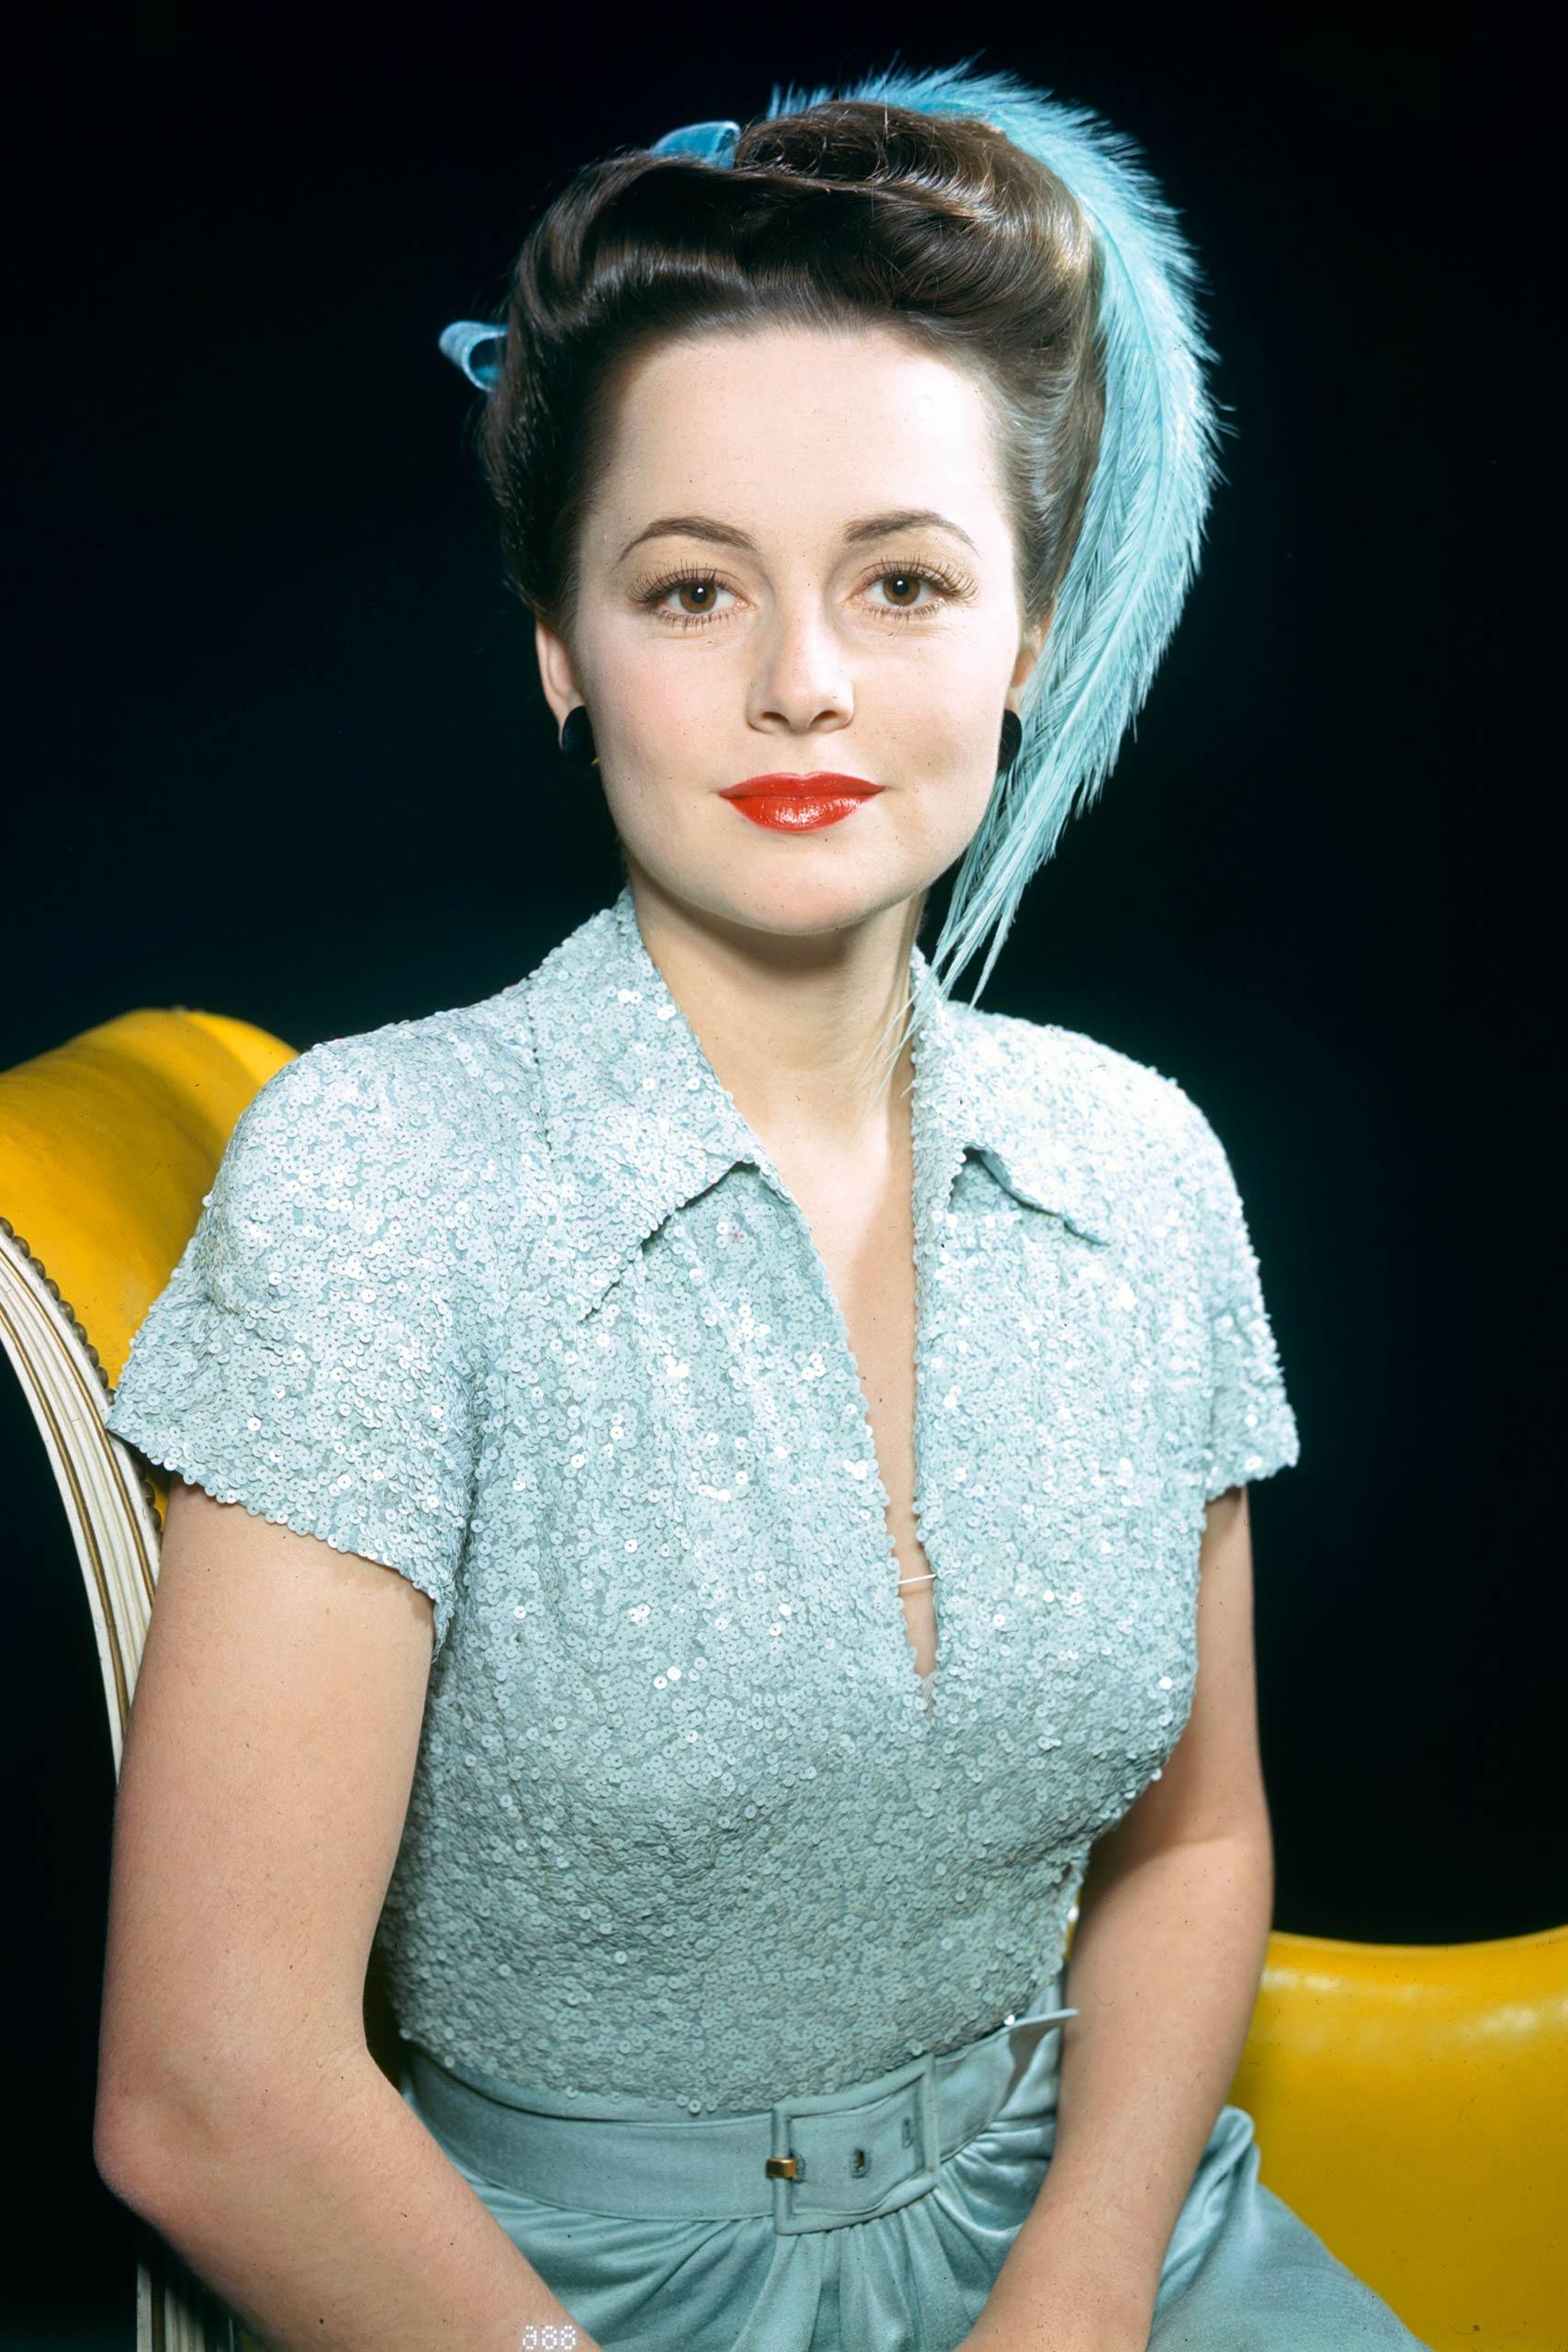 <strong>1947: Olivia de Havilland - <i>To Each His Own</i>                                   1950: Olivia de Havilland - <i>The Heiress</i></strong>